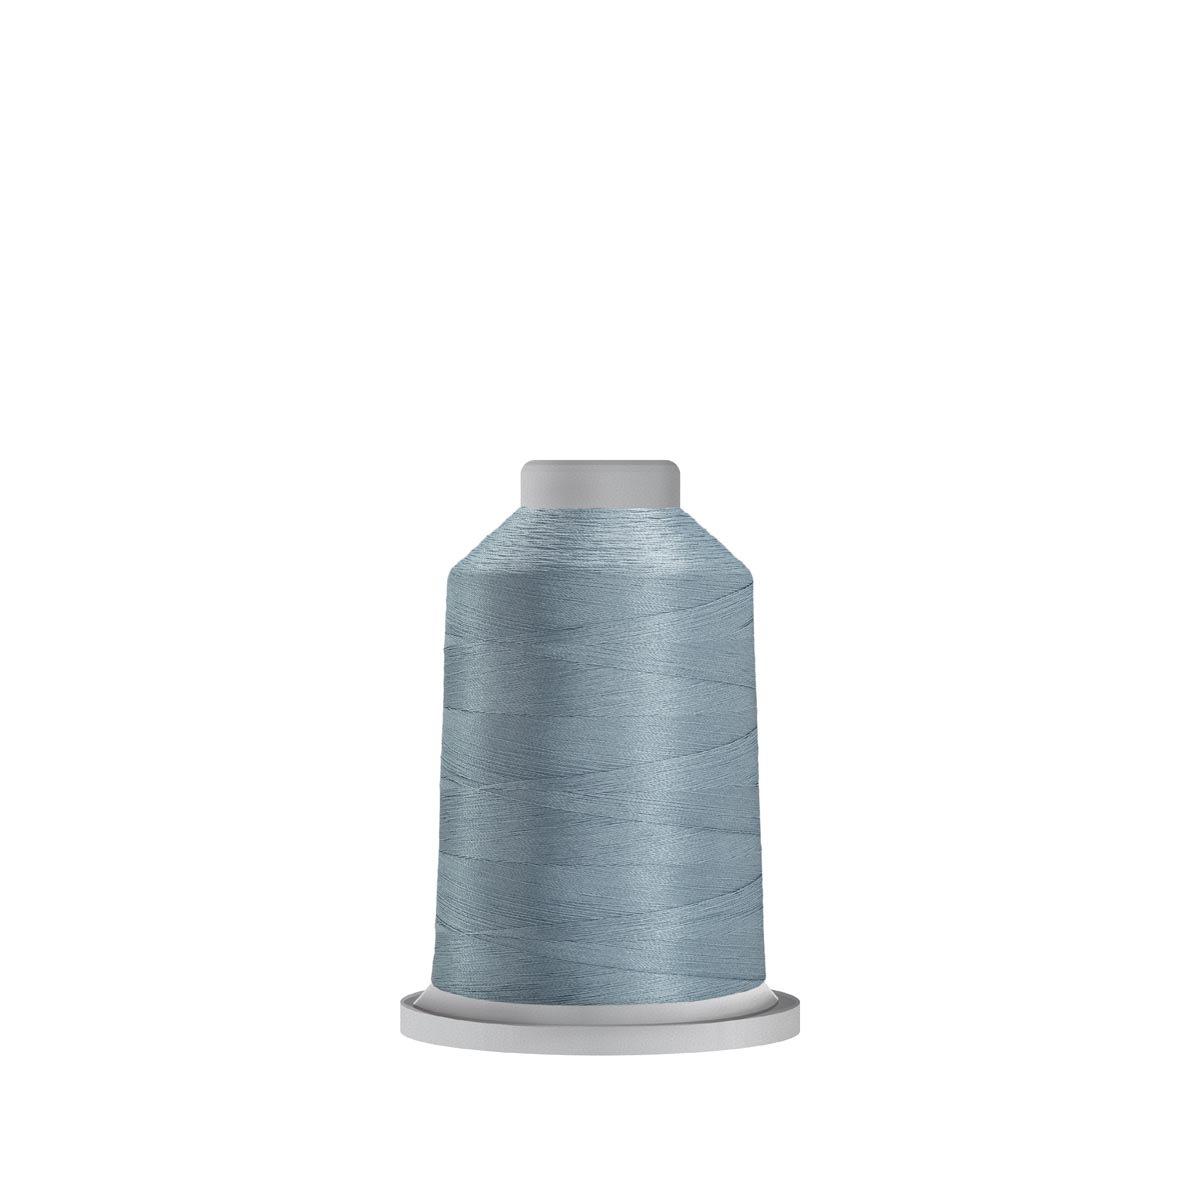 Glide Trilobal Polyester No. 40 Thread - Steel Blue